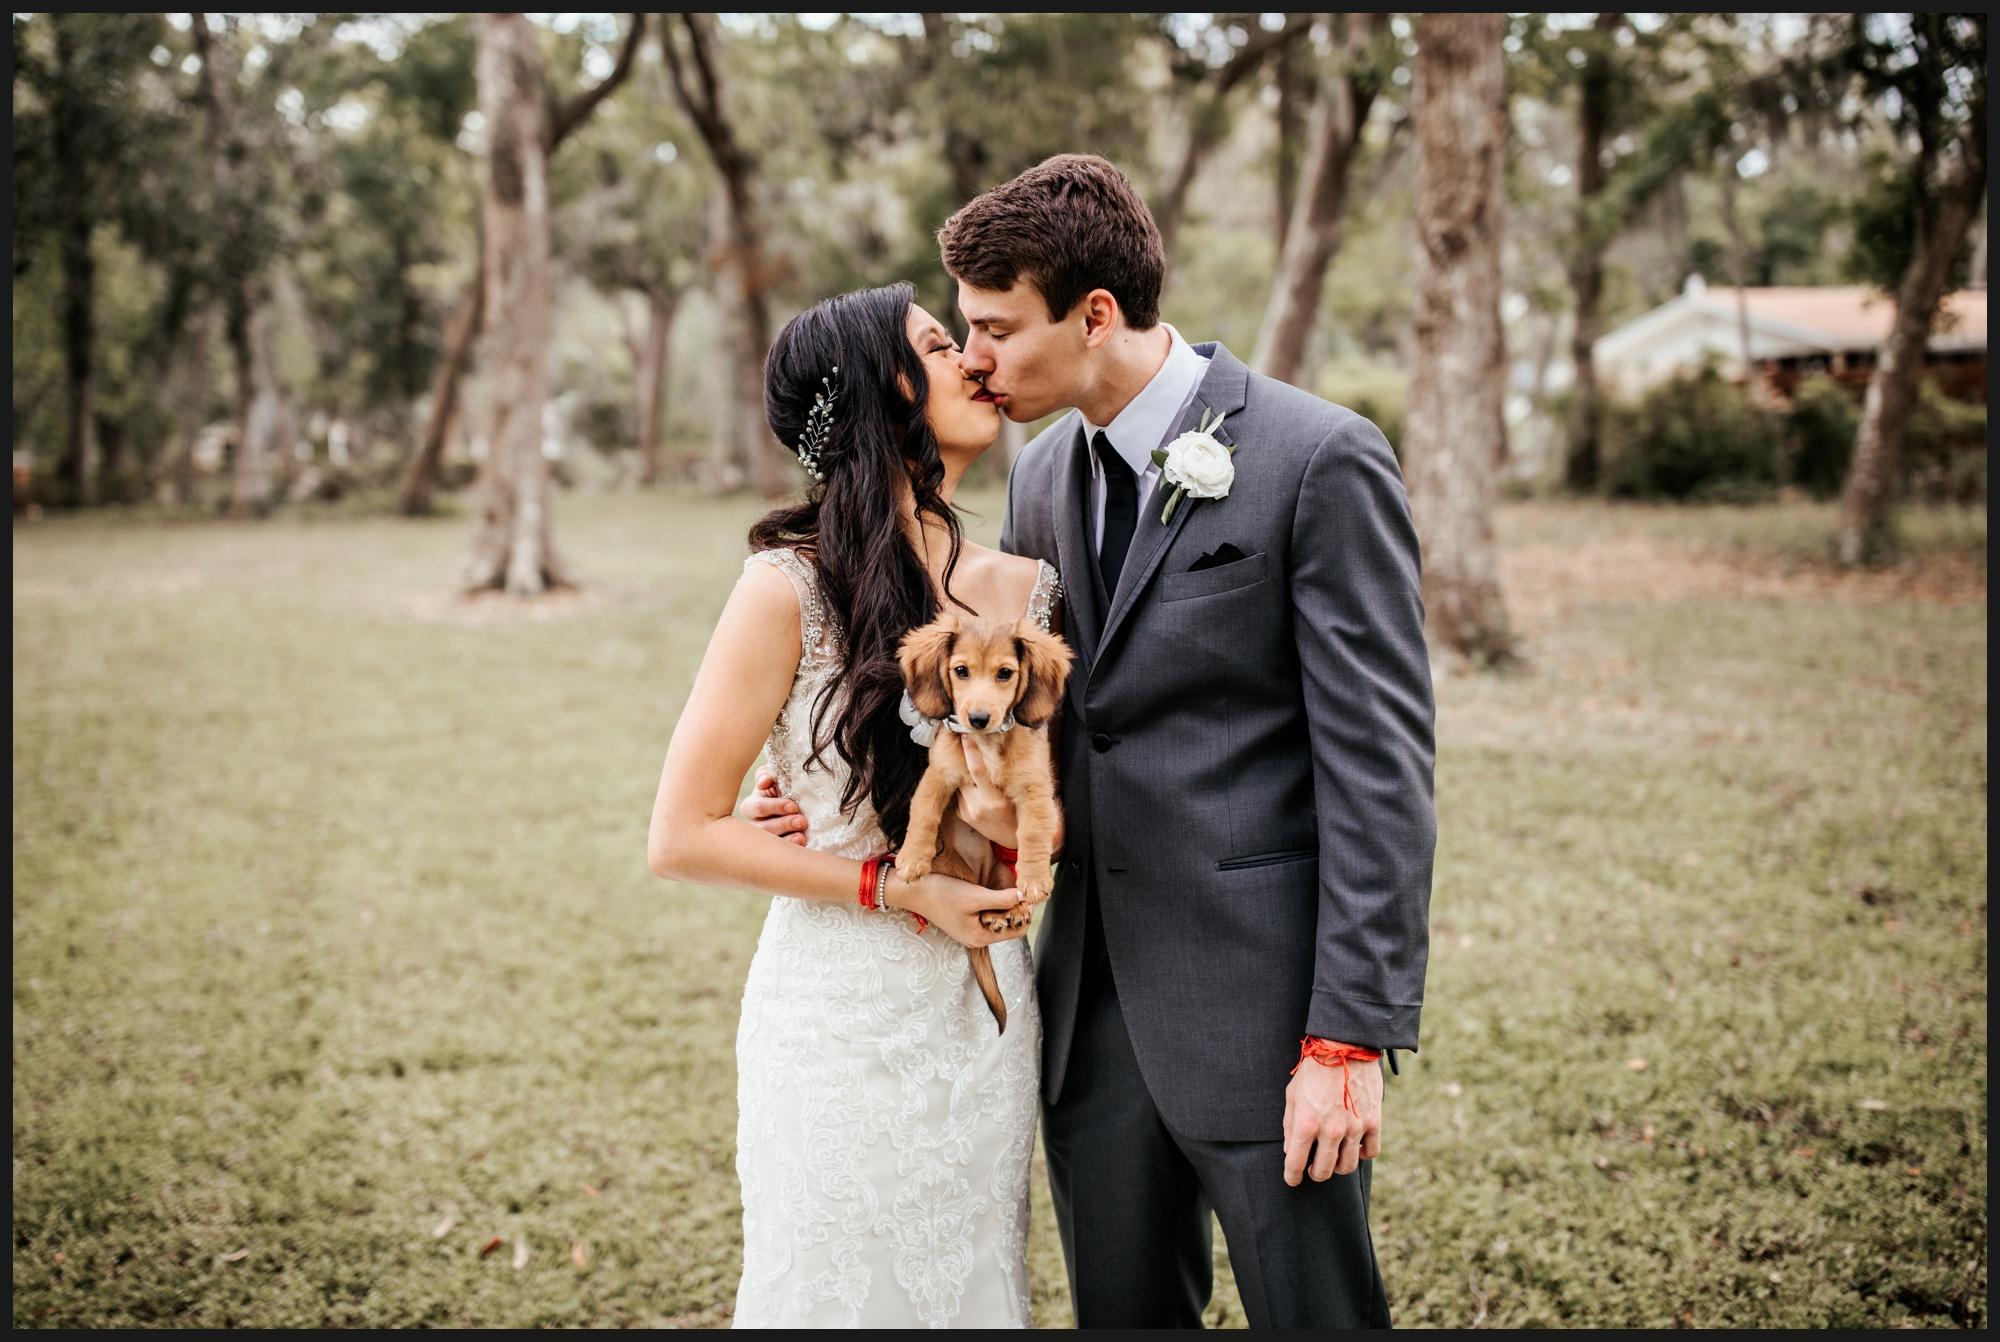 Orlando-Wedding-Photographer-destination-wedding-photographer-florida-wedding-photographer-bohemian-wedding-photographer_1416.jpg